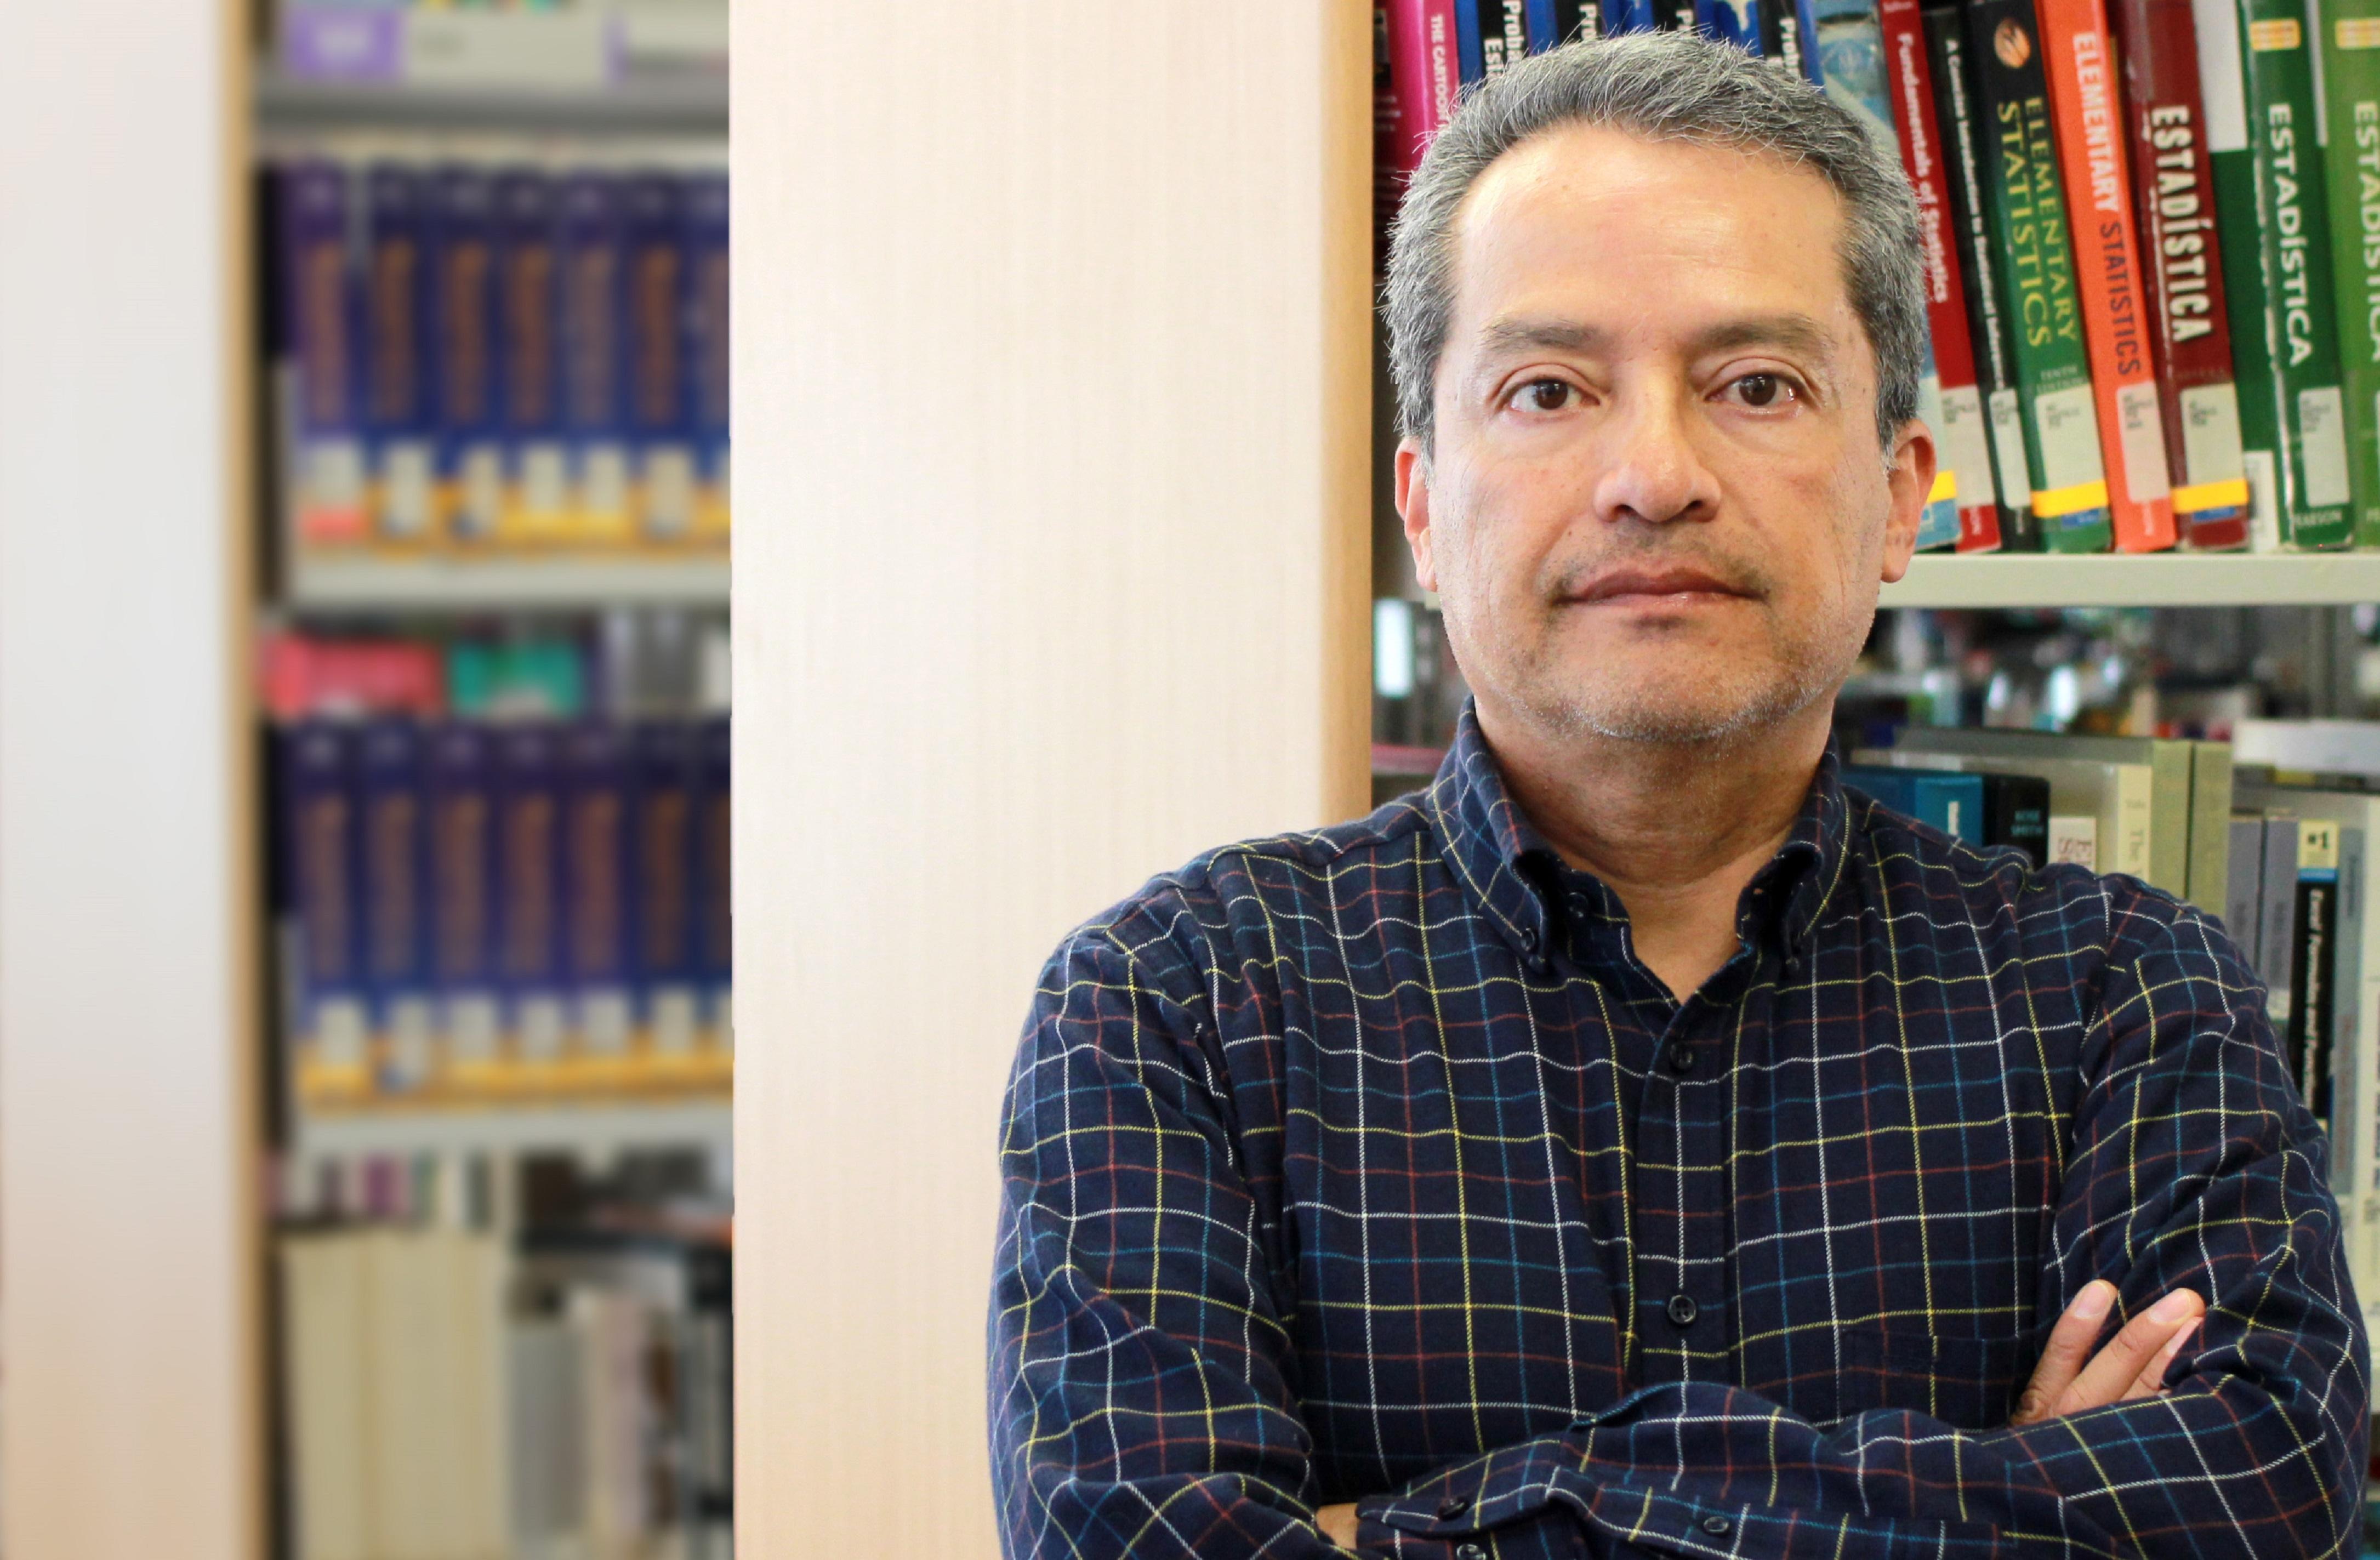 DR. MARIO ARMANDO TÉLLEZ GONZÁLEZ